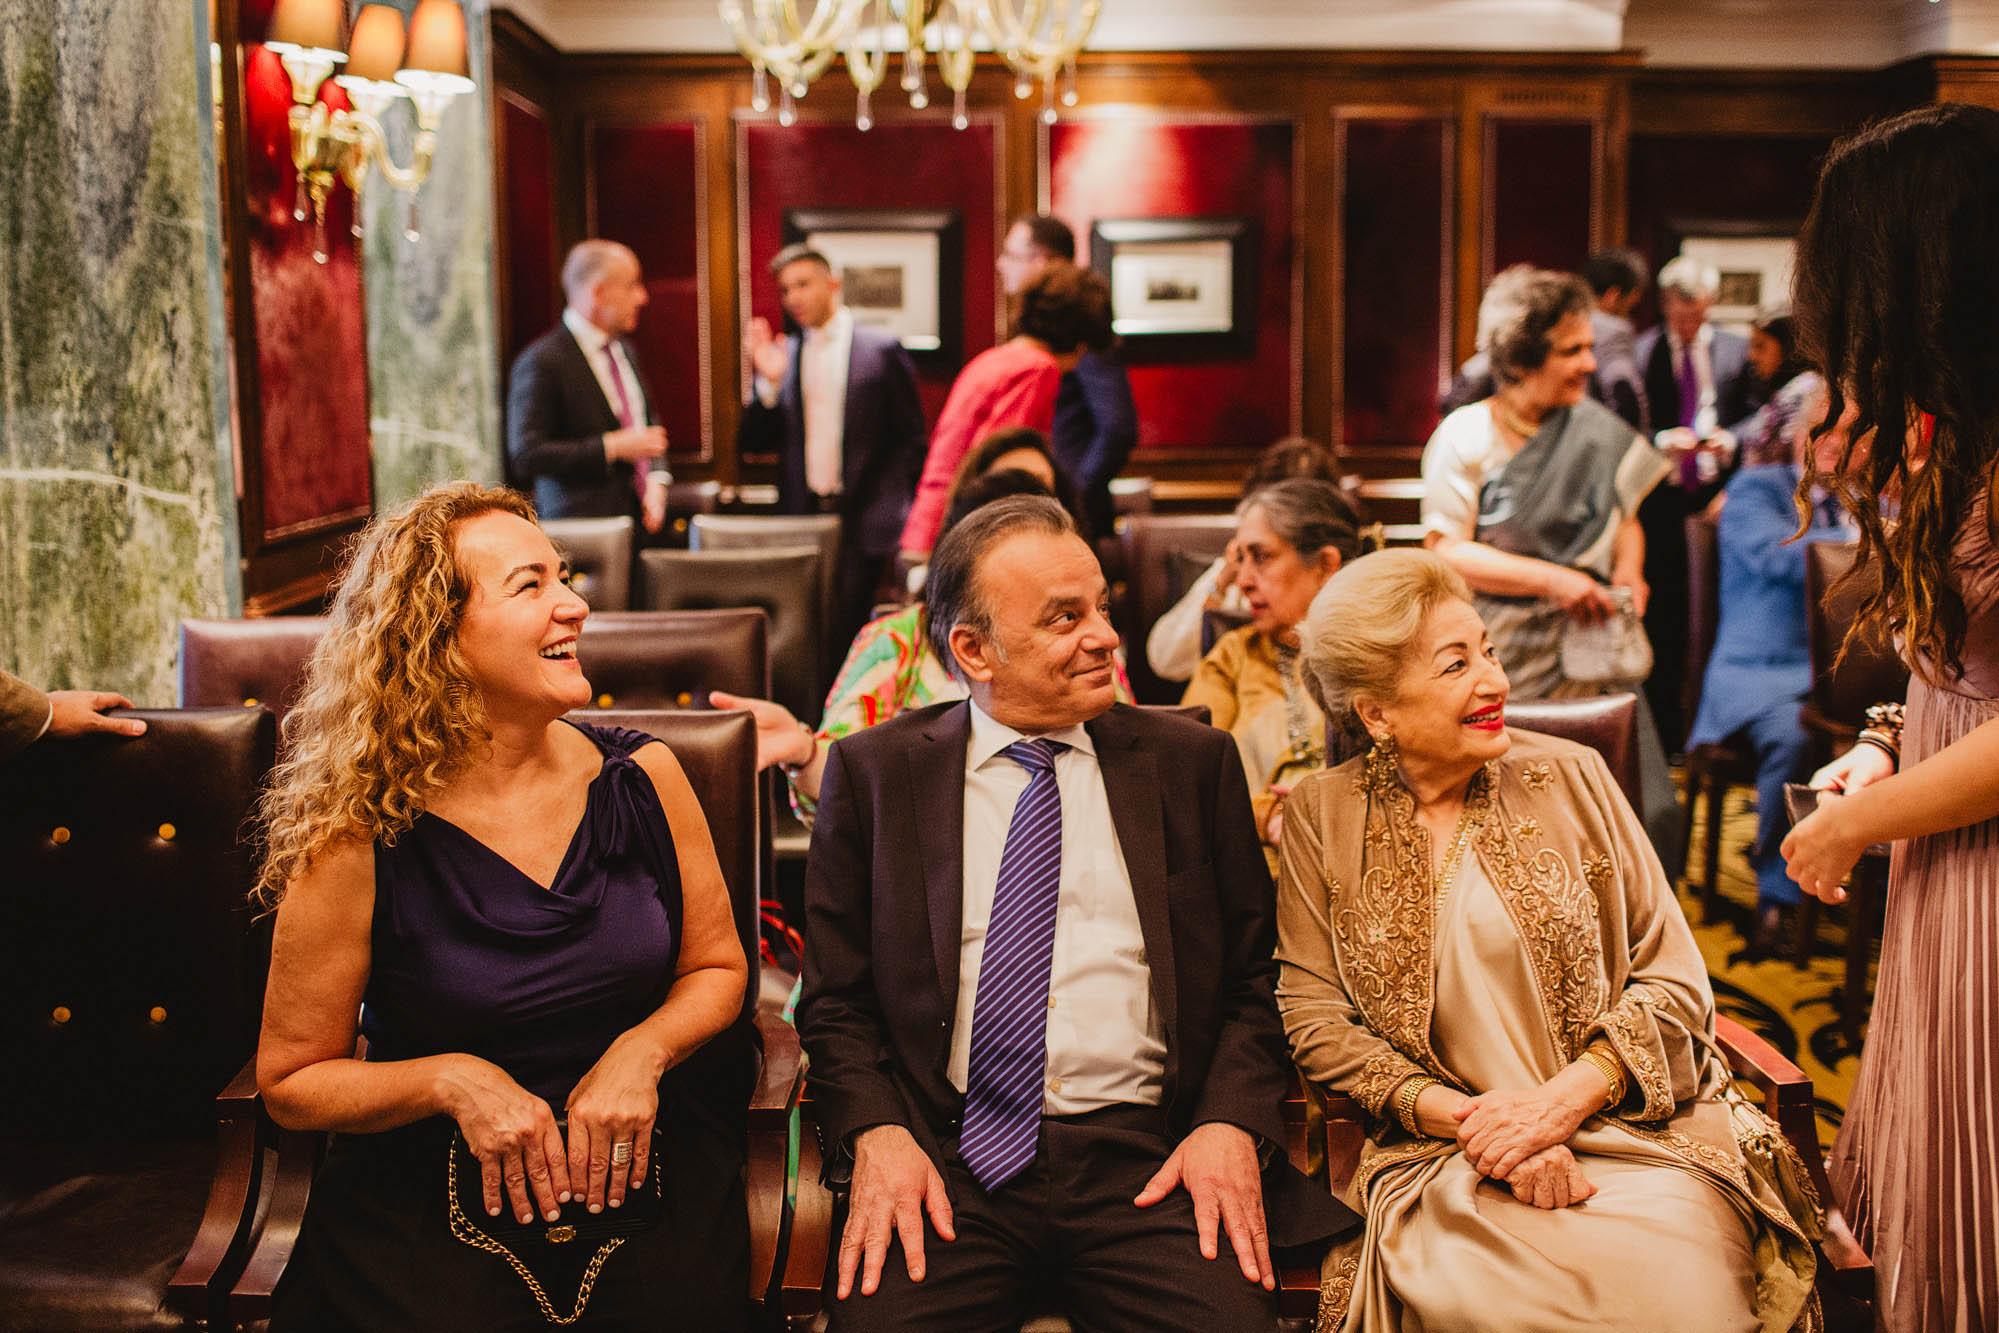 Goring hotel London wedding 9